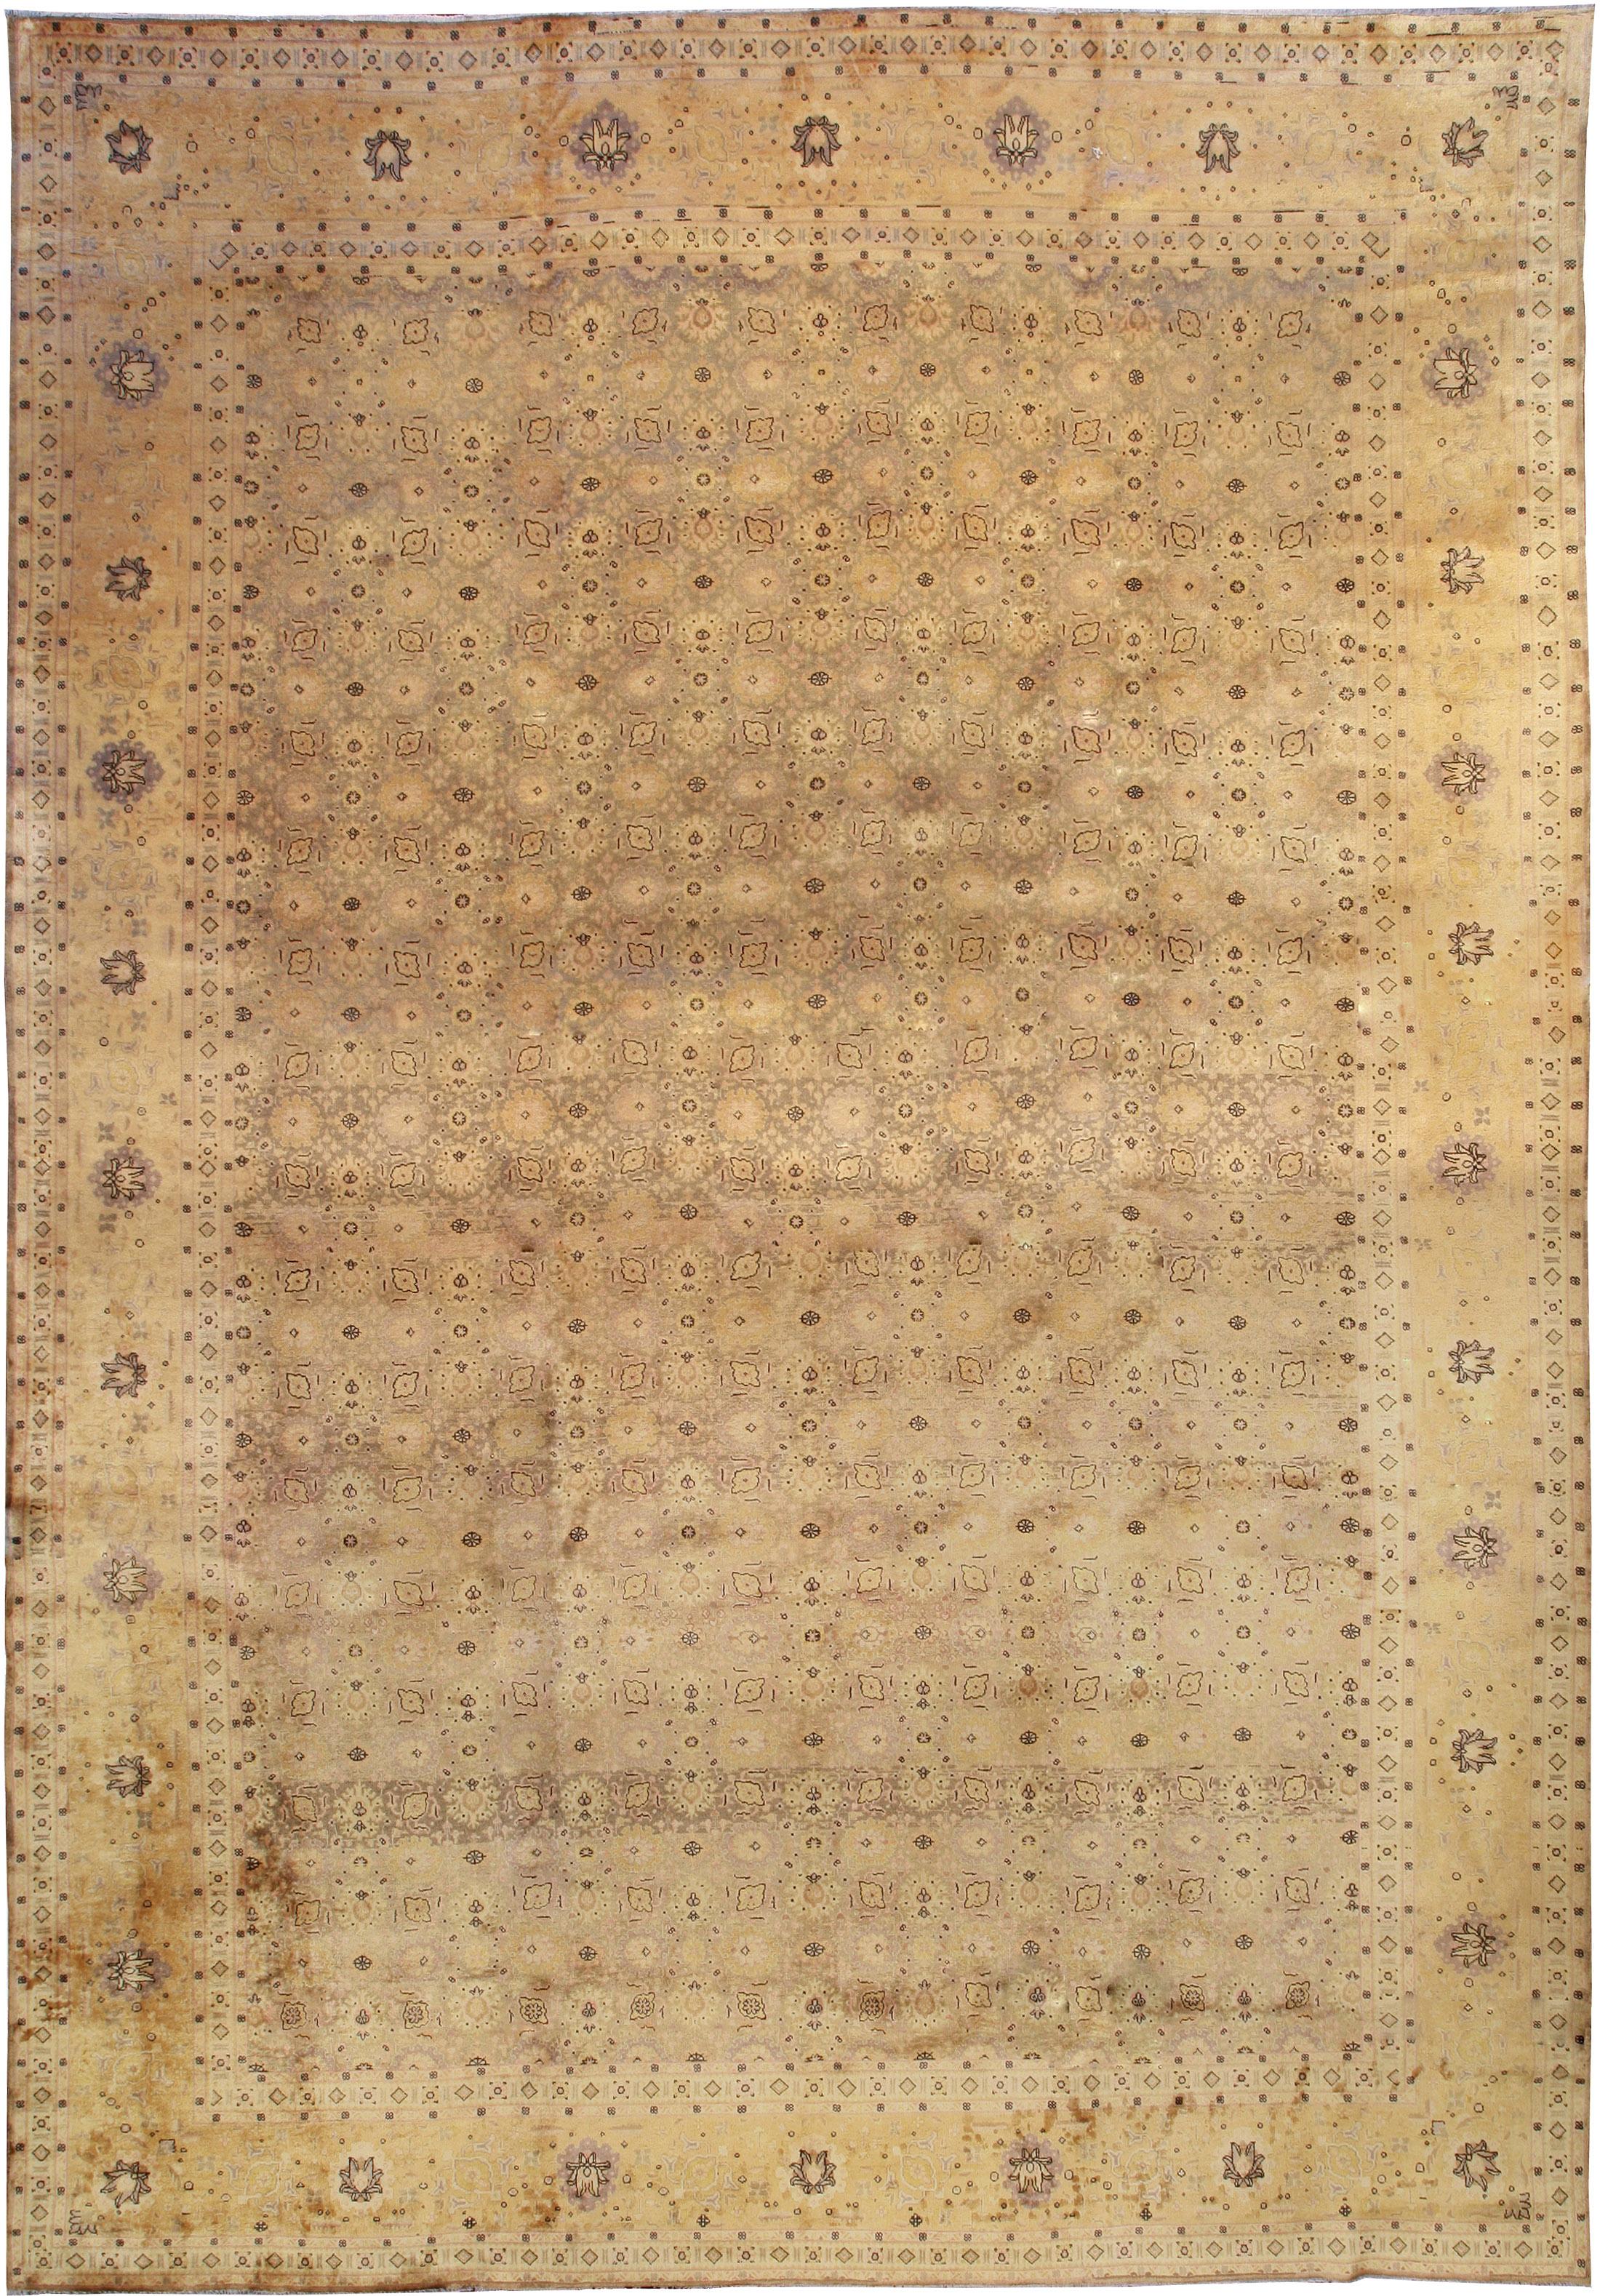 Antique Persian Tabriz Rug BB0876